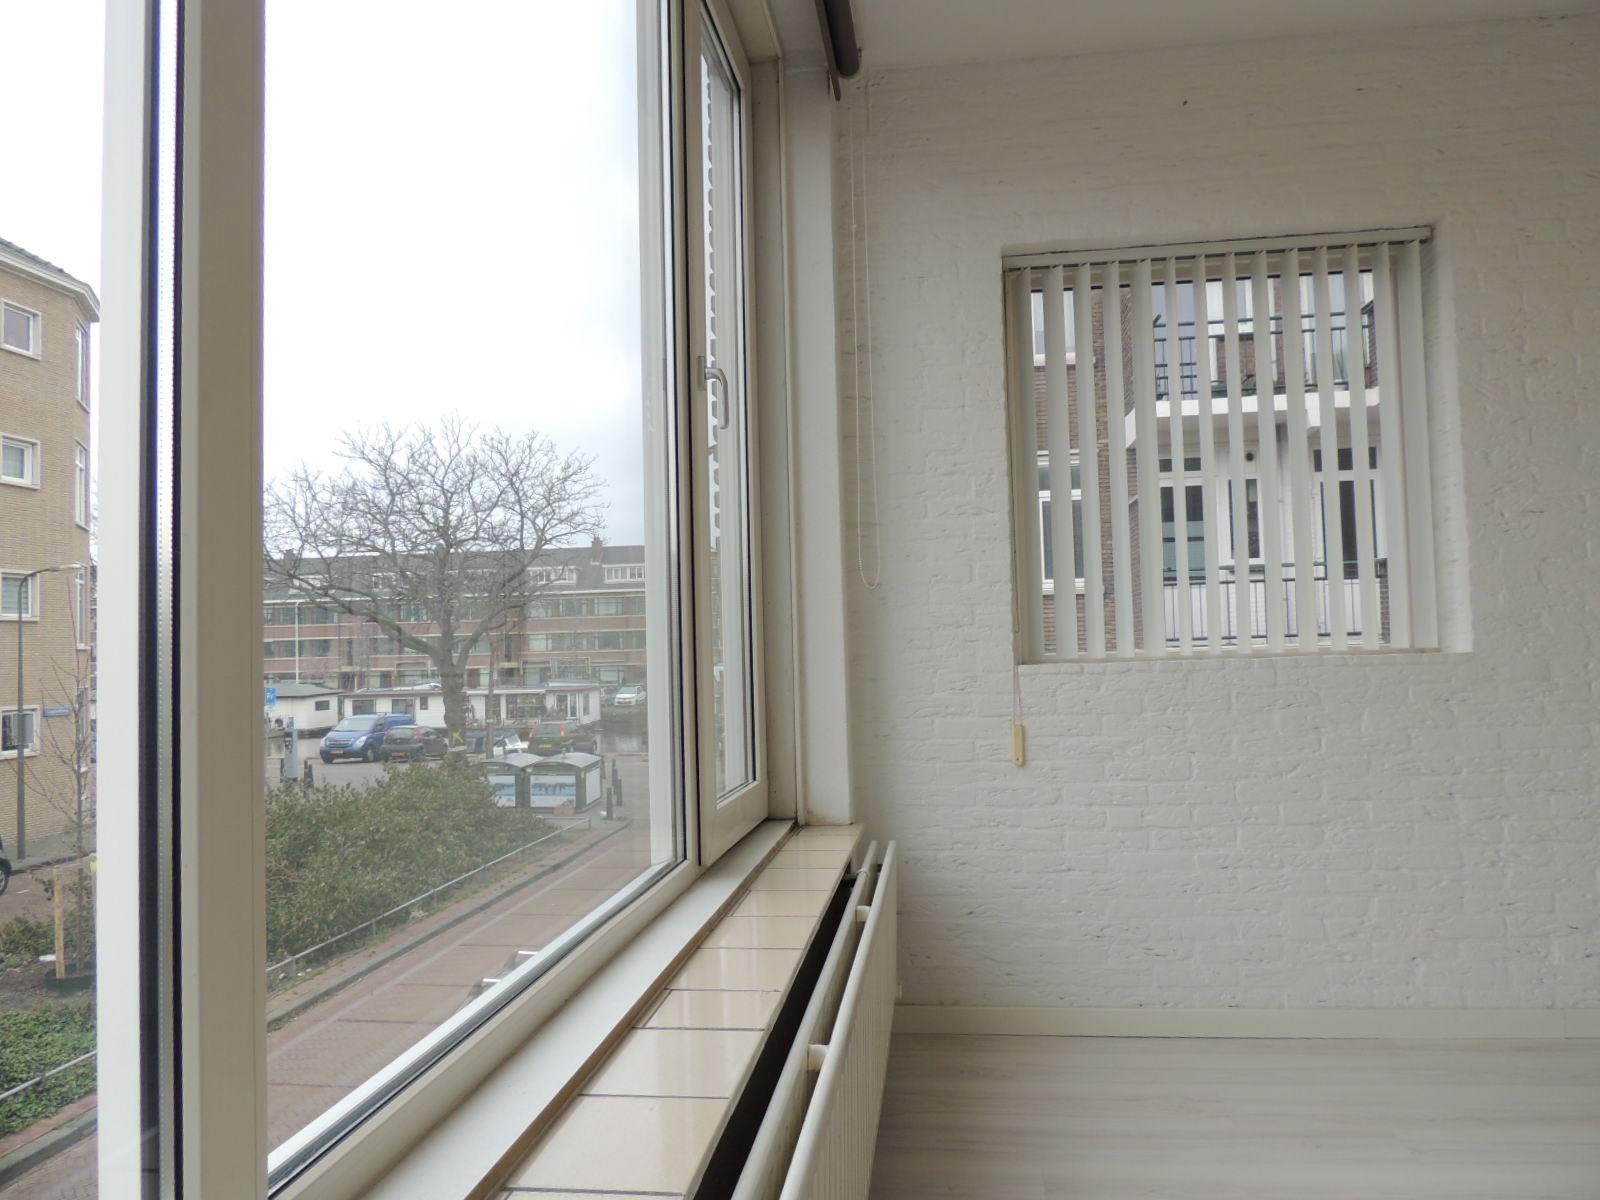 Lopikstraat, The Hague